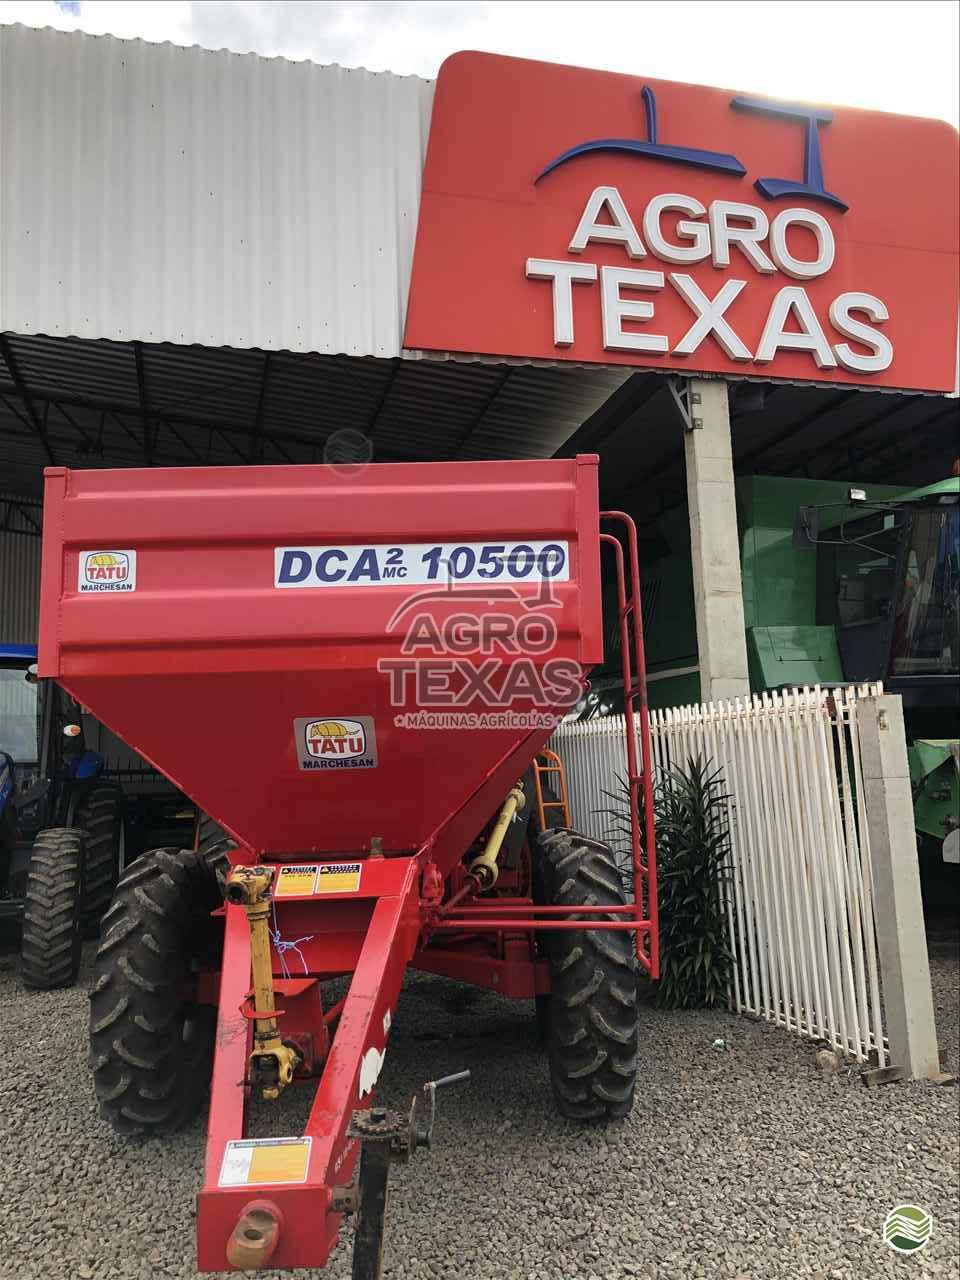 IMPLEMENTOS AGRICOLAS DISTRIBUIDOR CALCÁRIO 10000 Kg Agro Texas Máquinas Agrícolas VITORINO PARANÁ PR